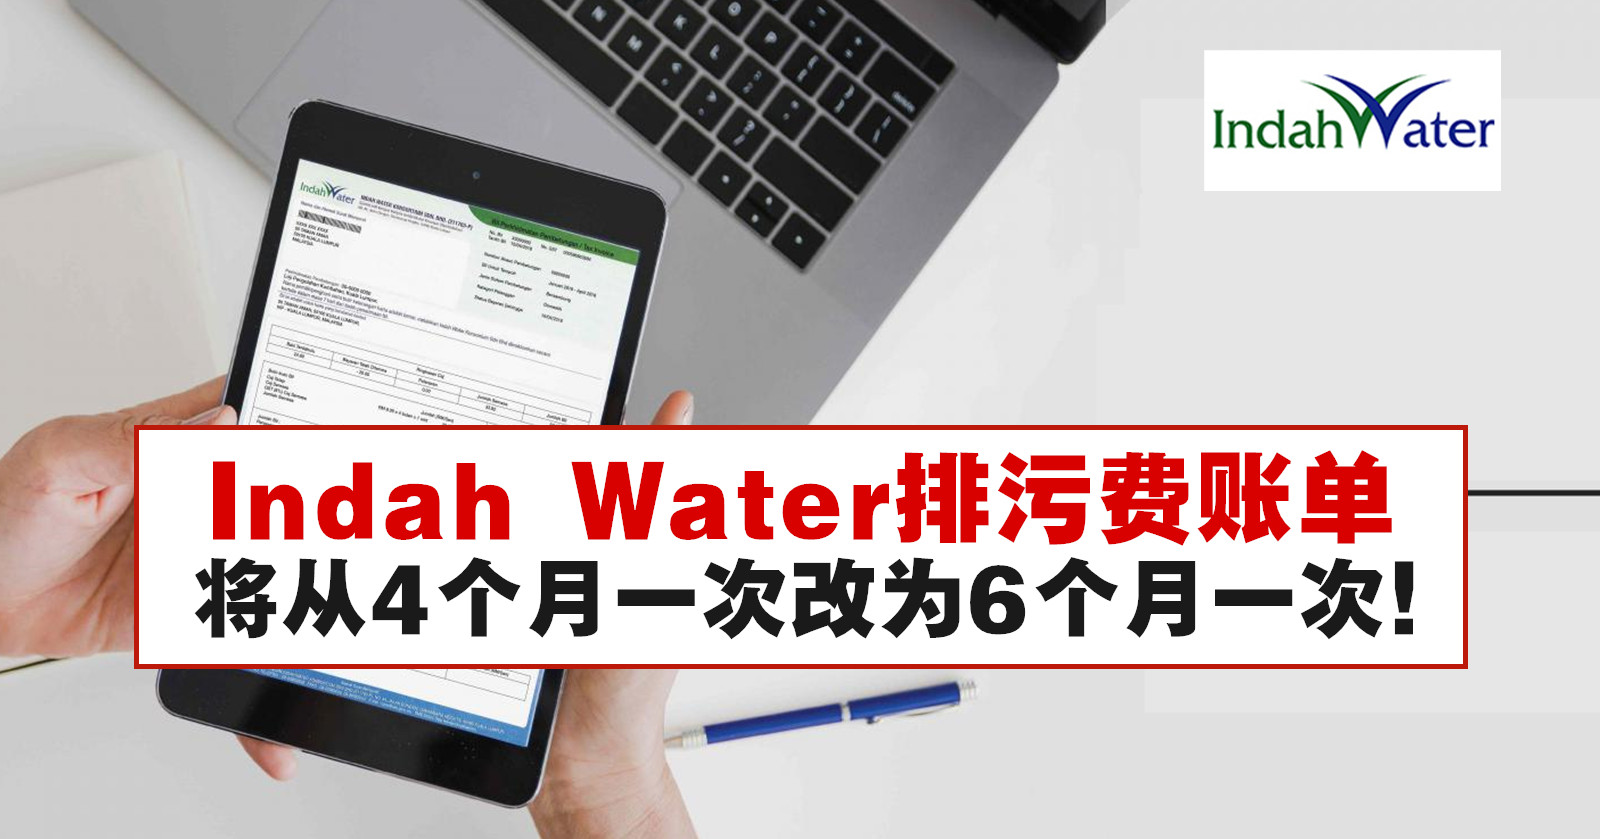 Indah Water排污费账单将从4个月一次改为6个月一次!